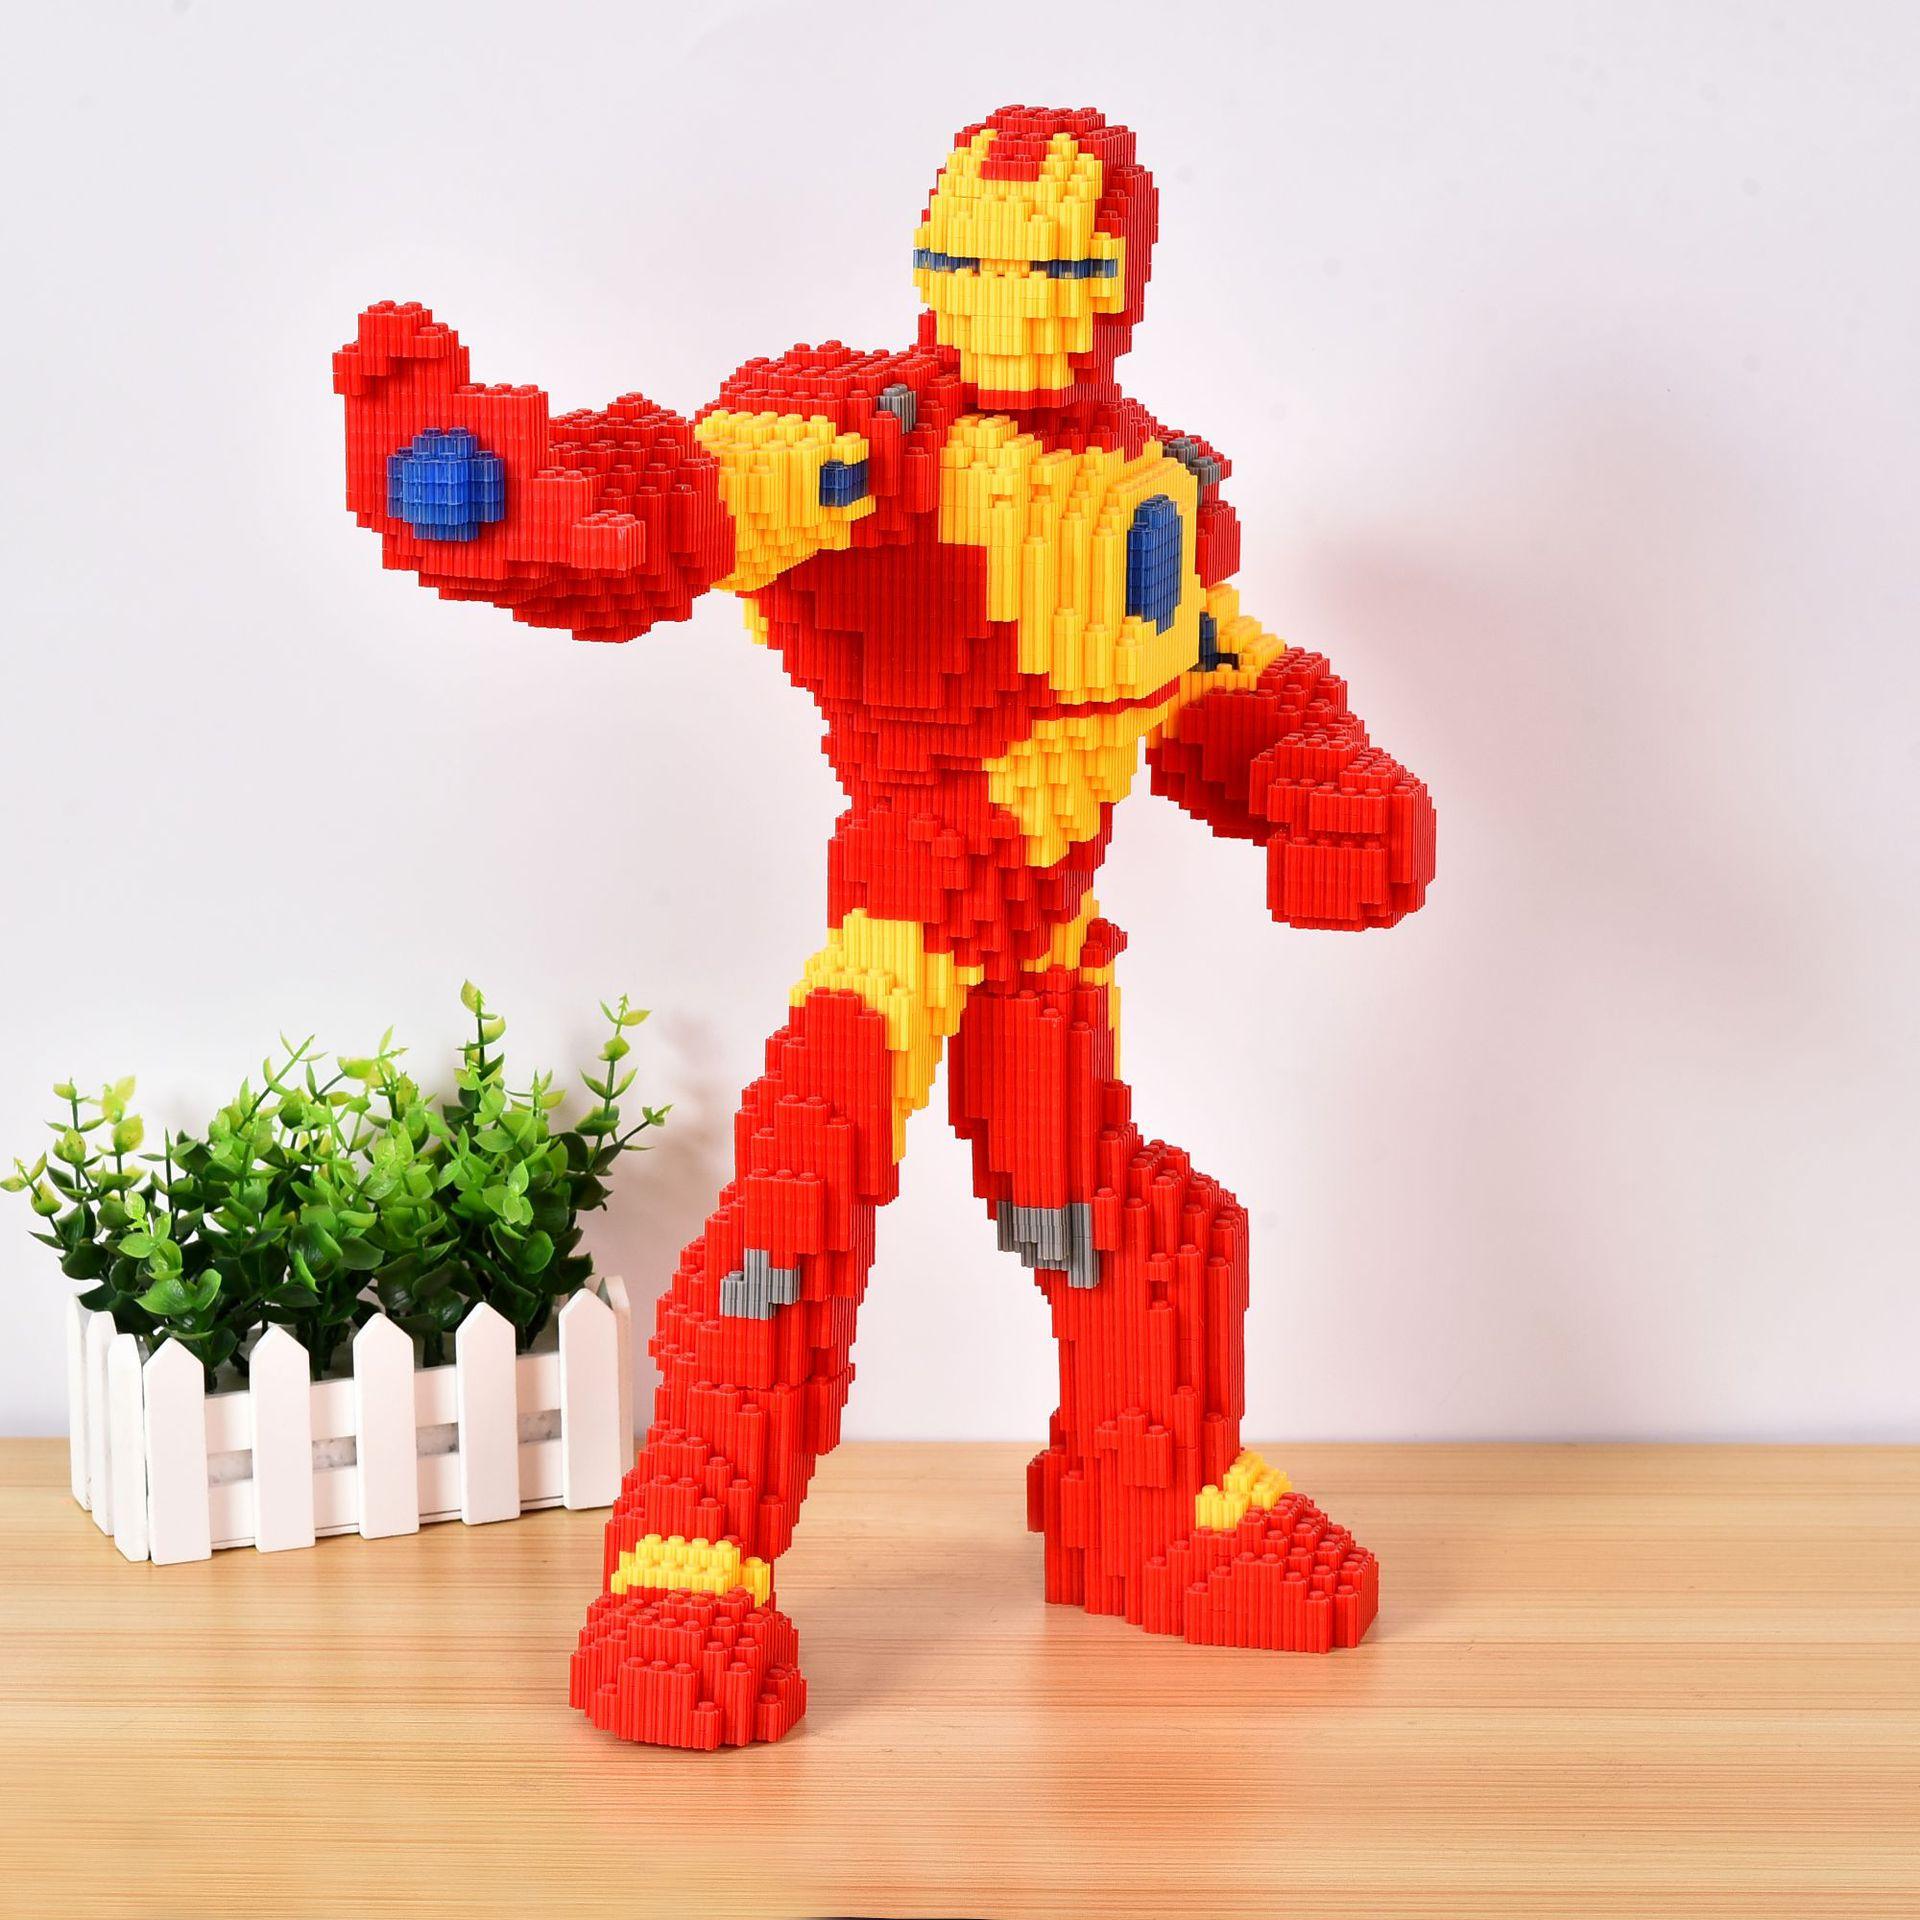 HAIPINCAI Creative early education puzzle assembly plastic toy diamond granule building block cartoo